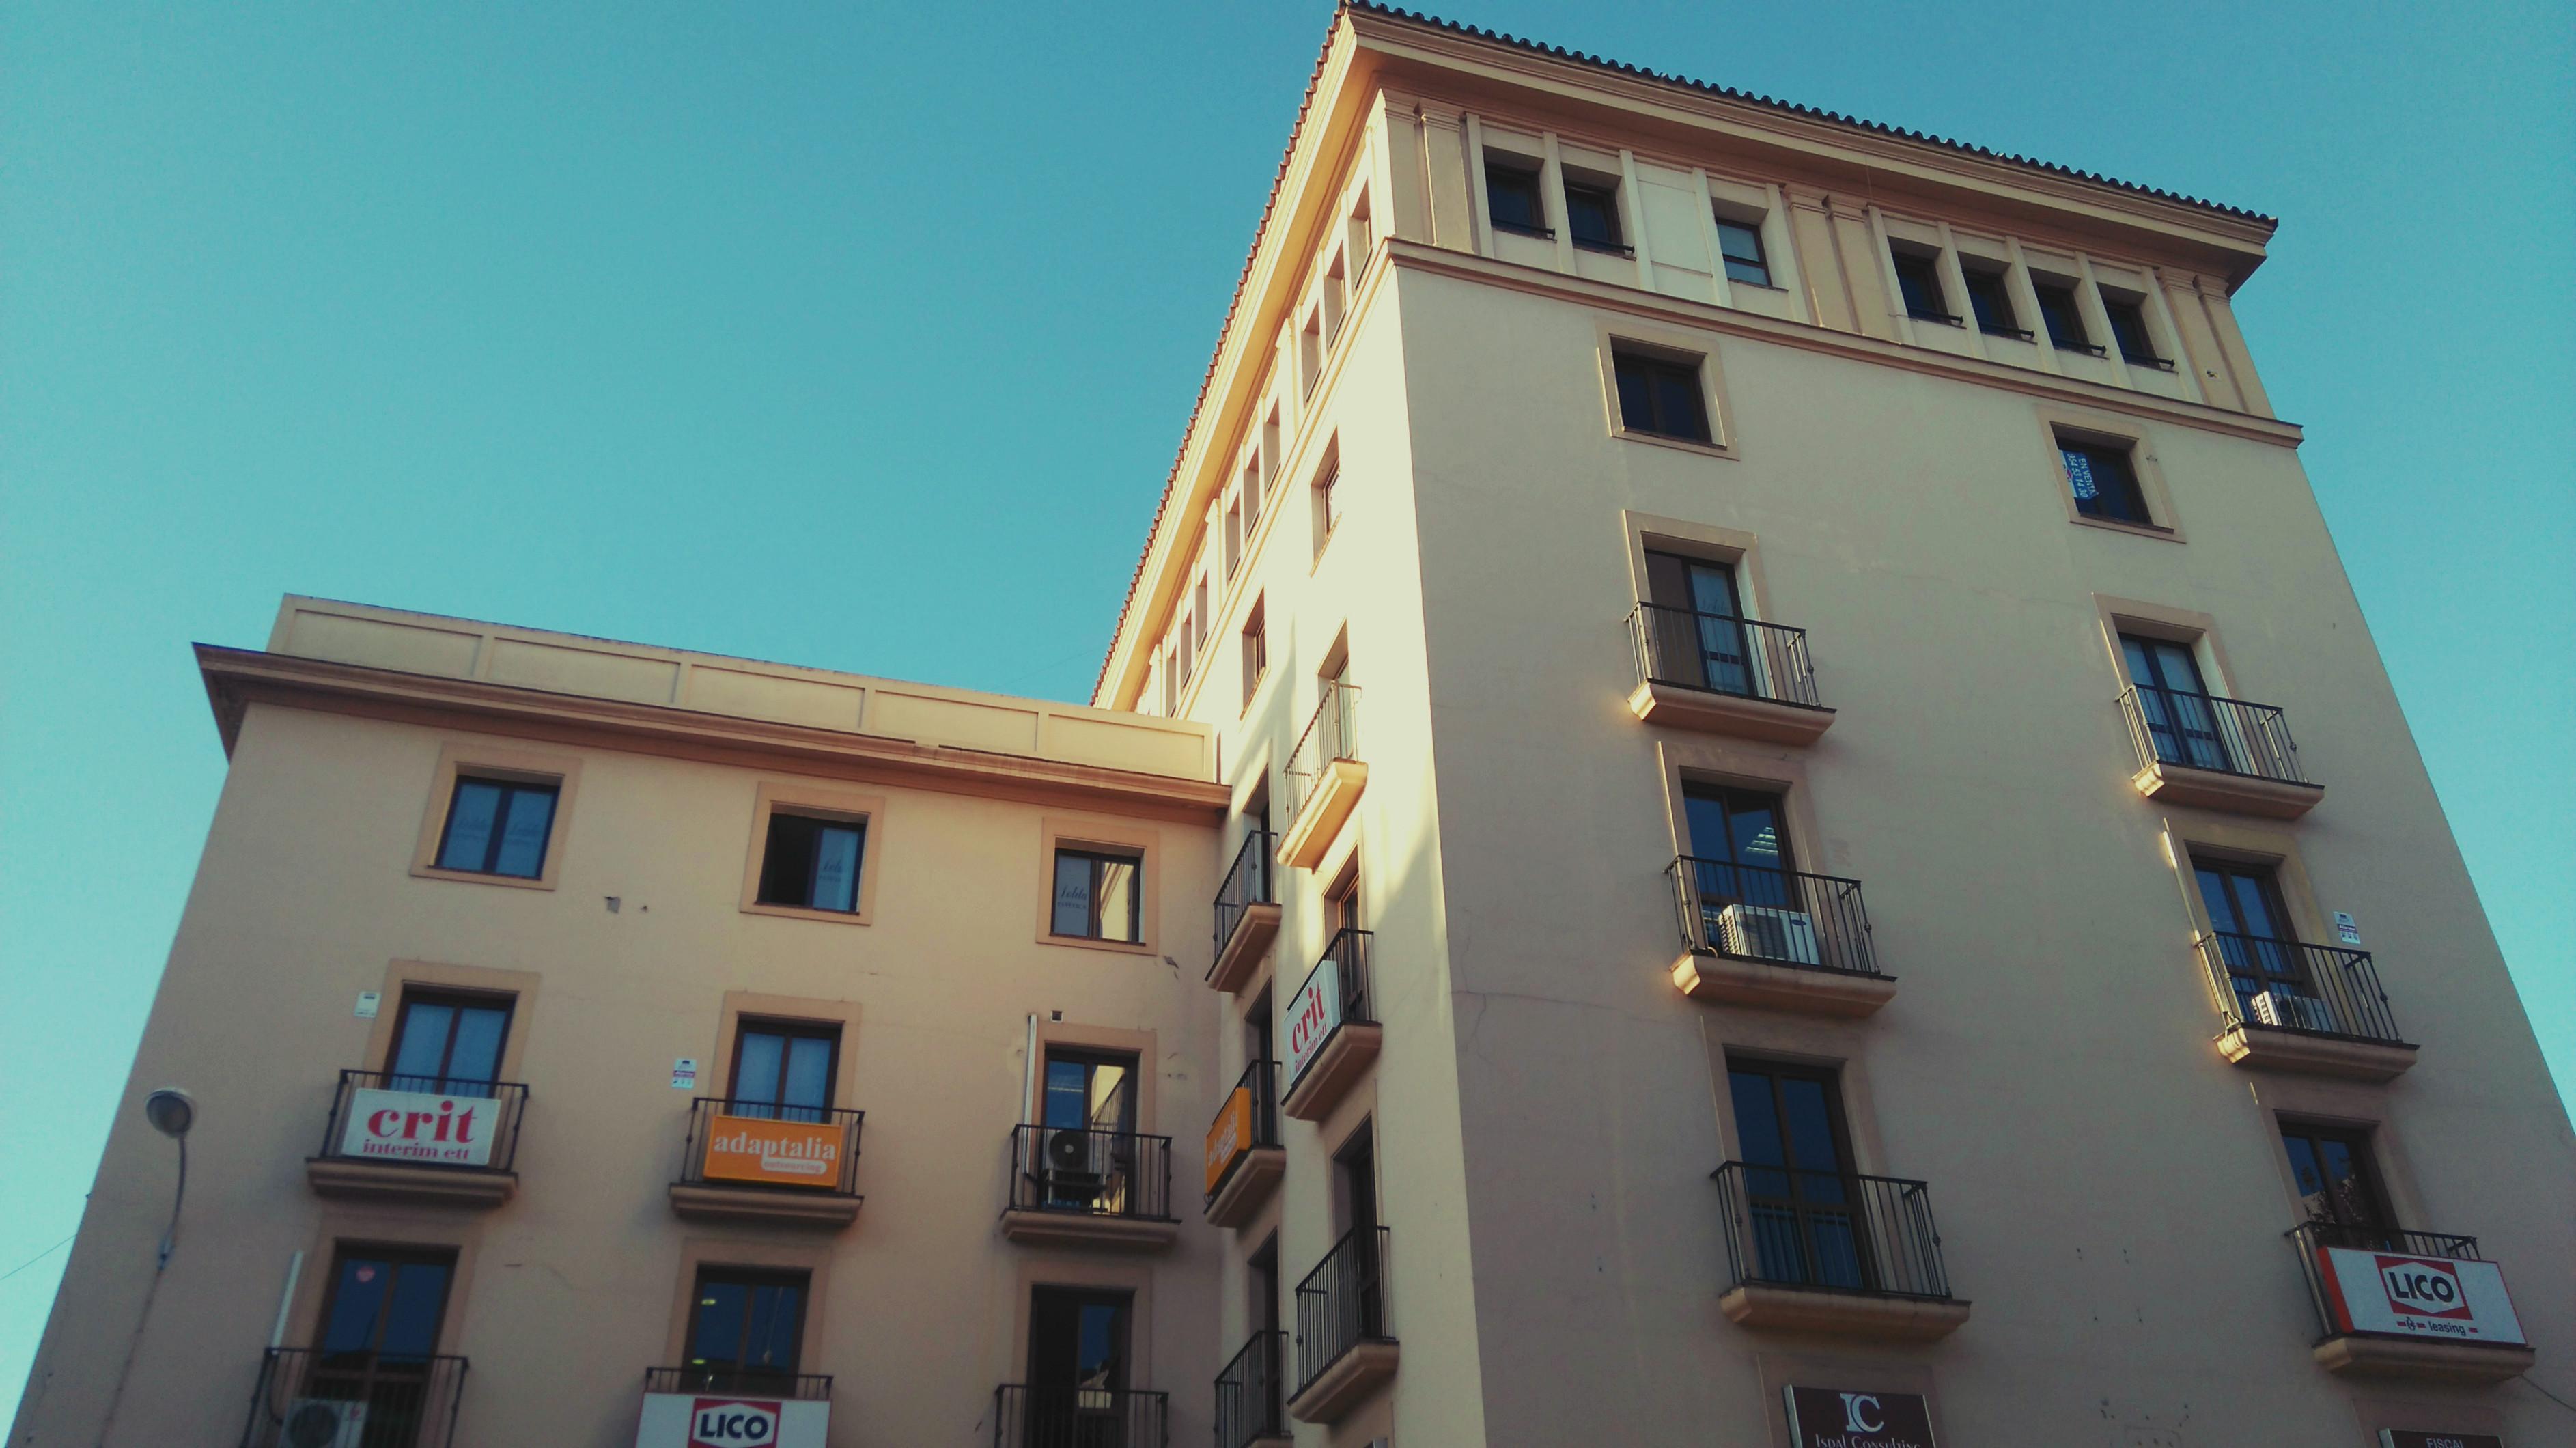 Arquitecto_Reyes_Catolicos_Sevilla_2